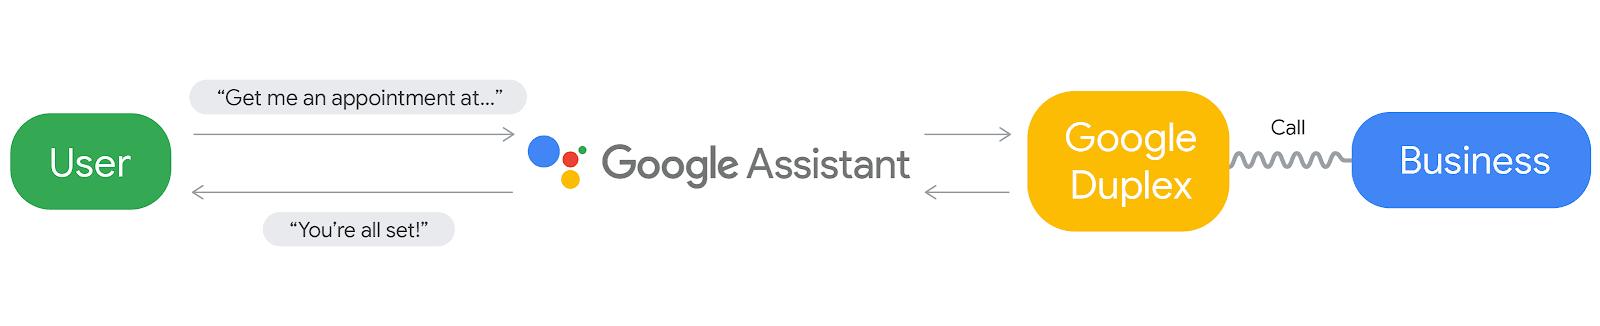 Google I/O '18 Roundup: Android P Beta, neue System-Navigation, Google Duplex, bessere Kamera 1